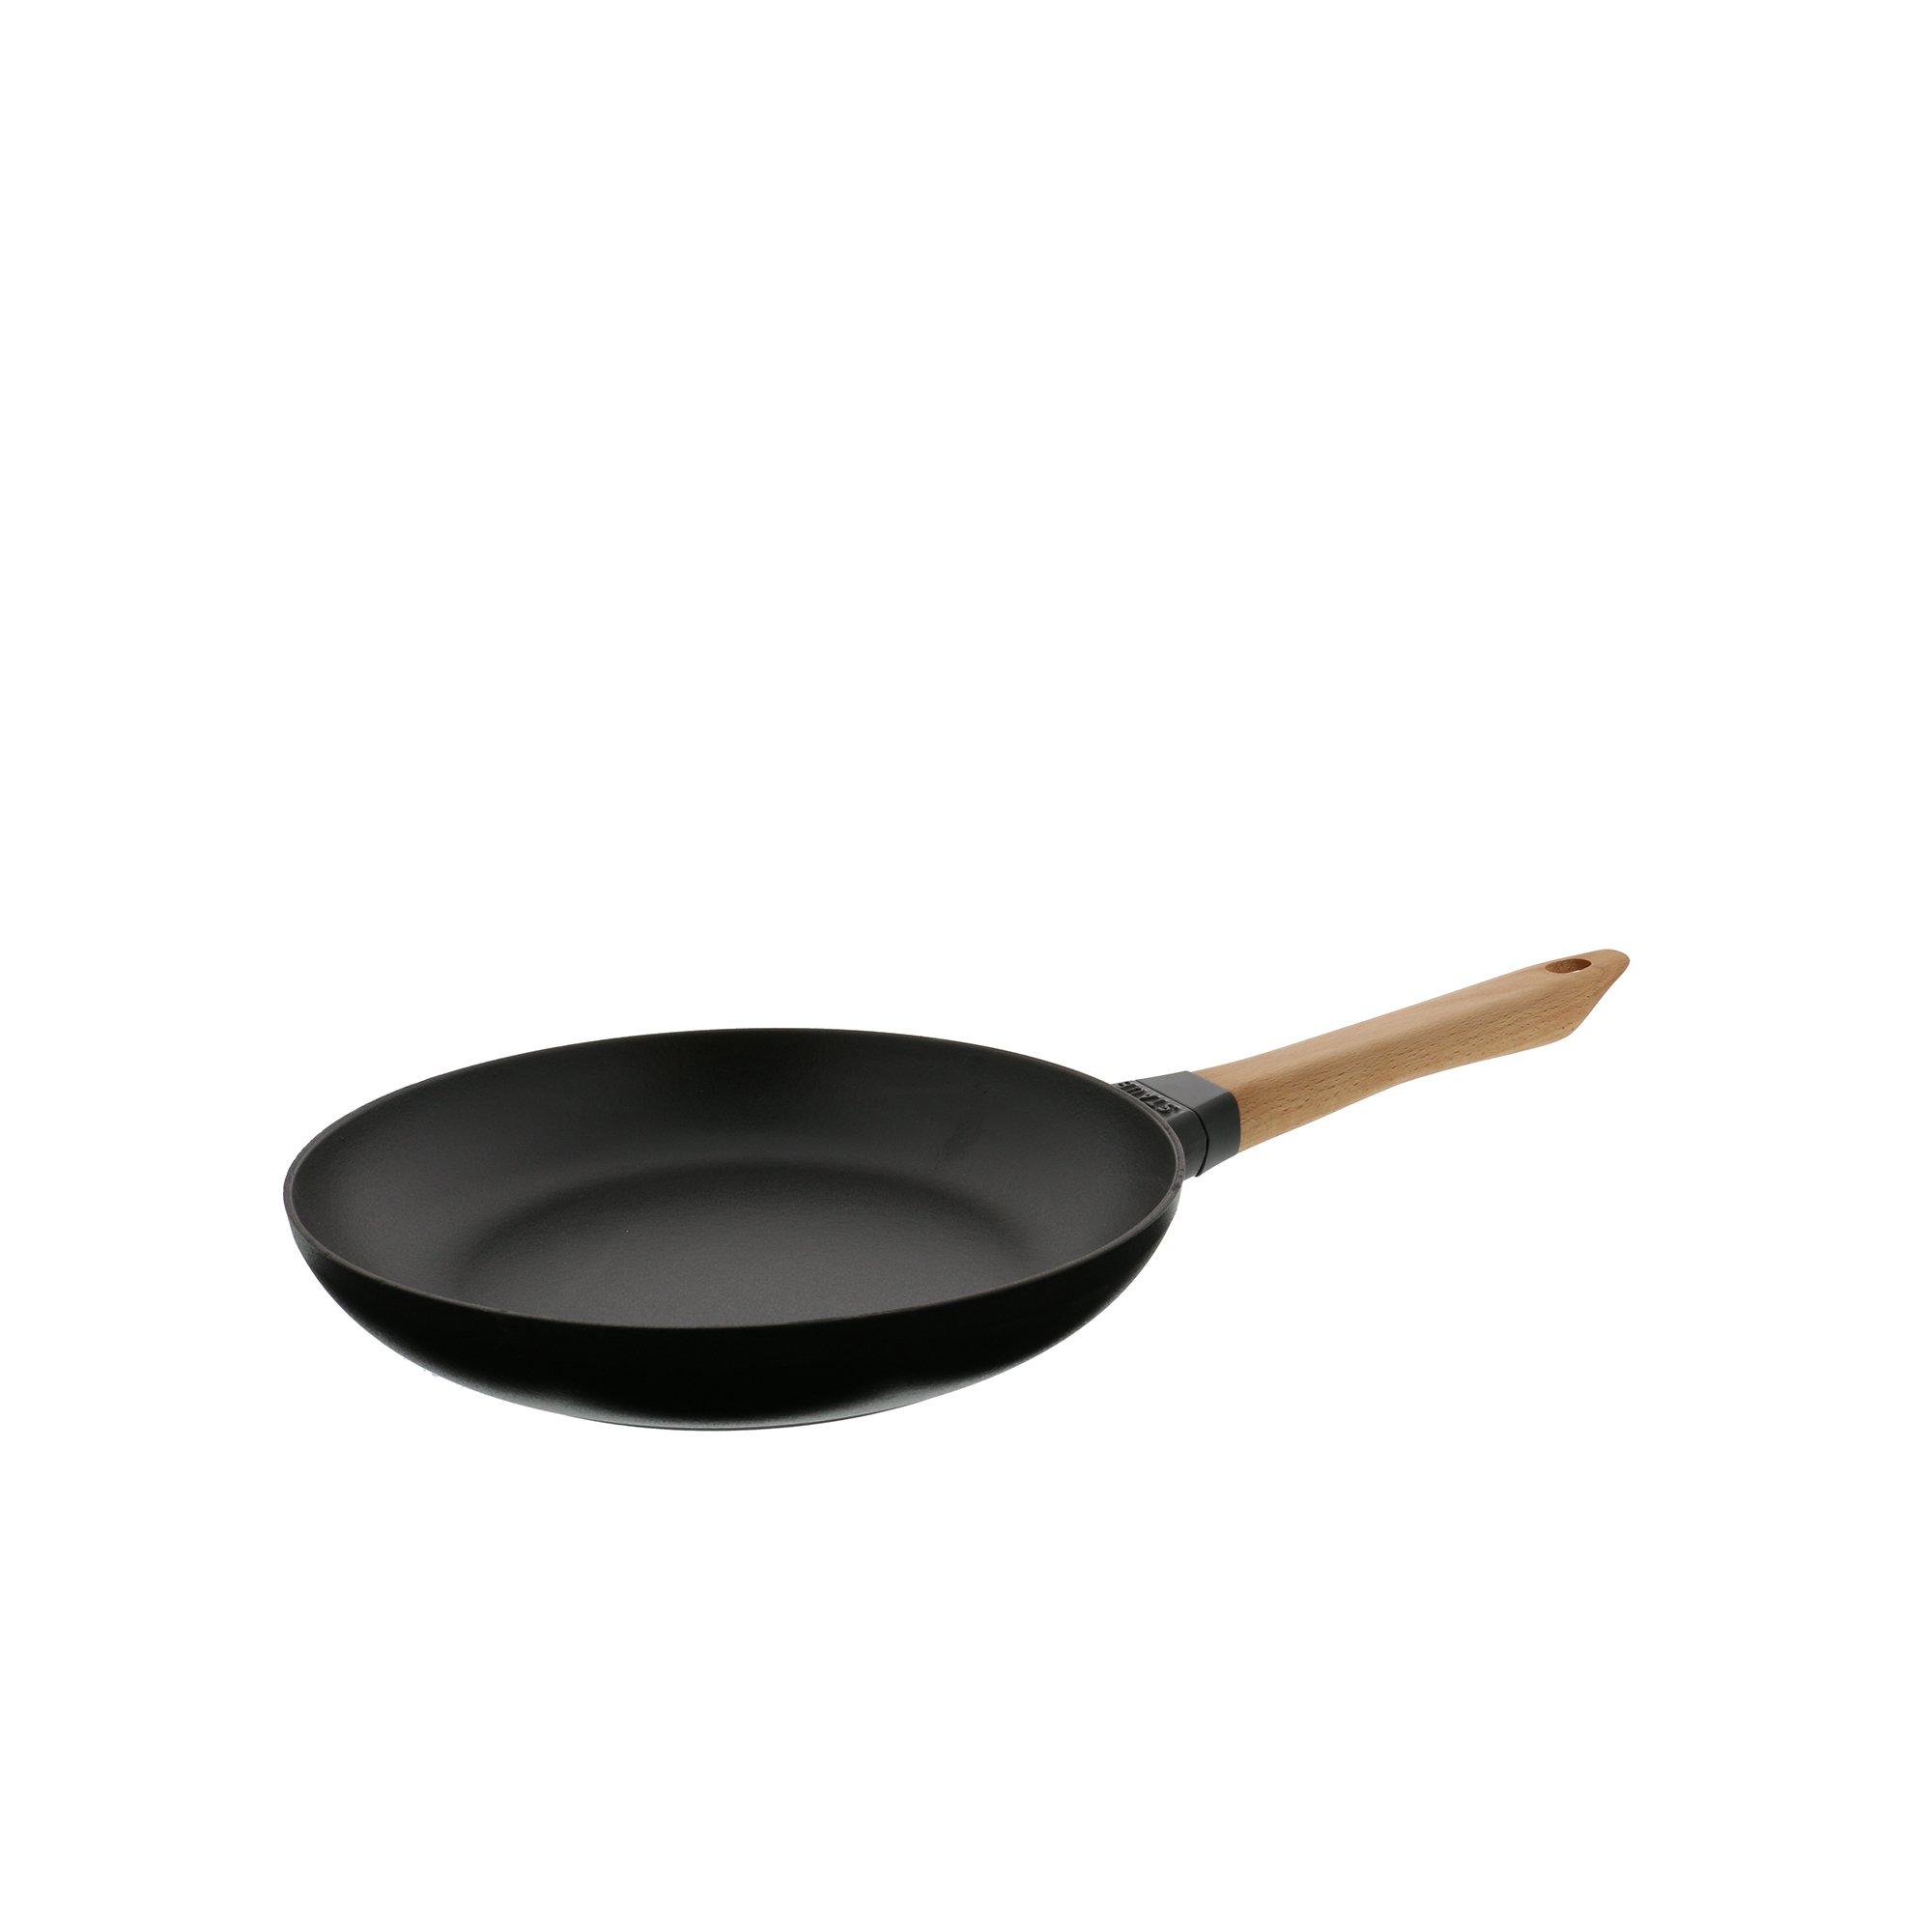 Staub 12242623 Cast Iron Fry Pan, 10-inch, Black Matte